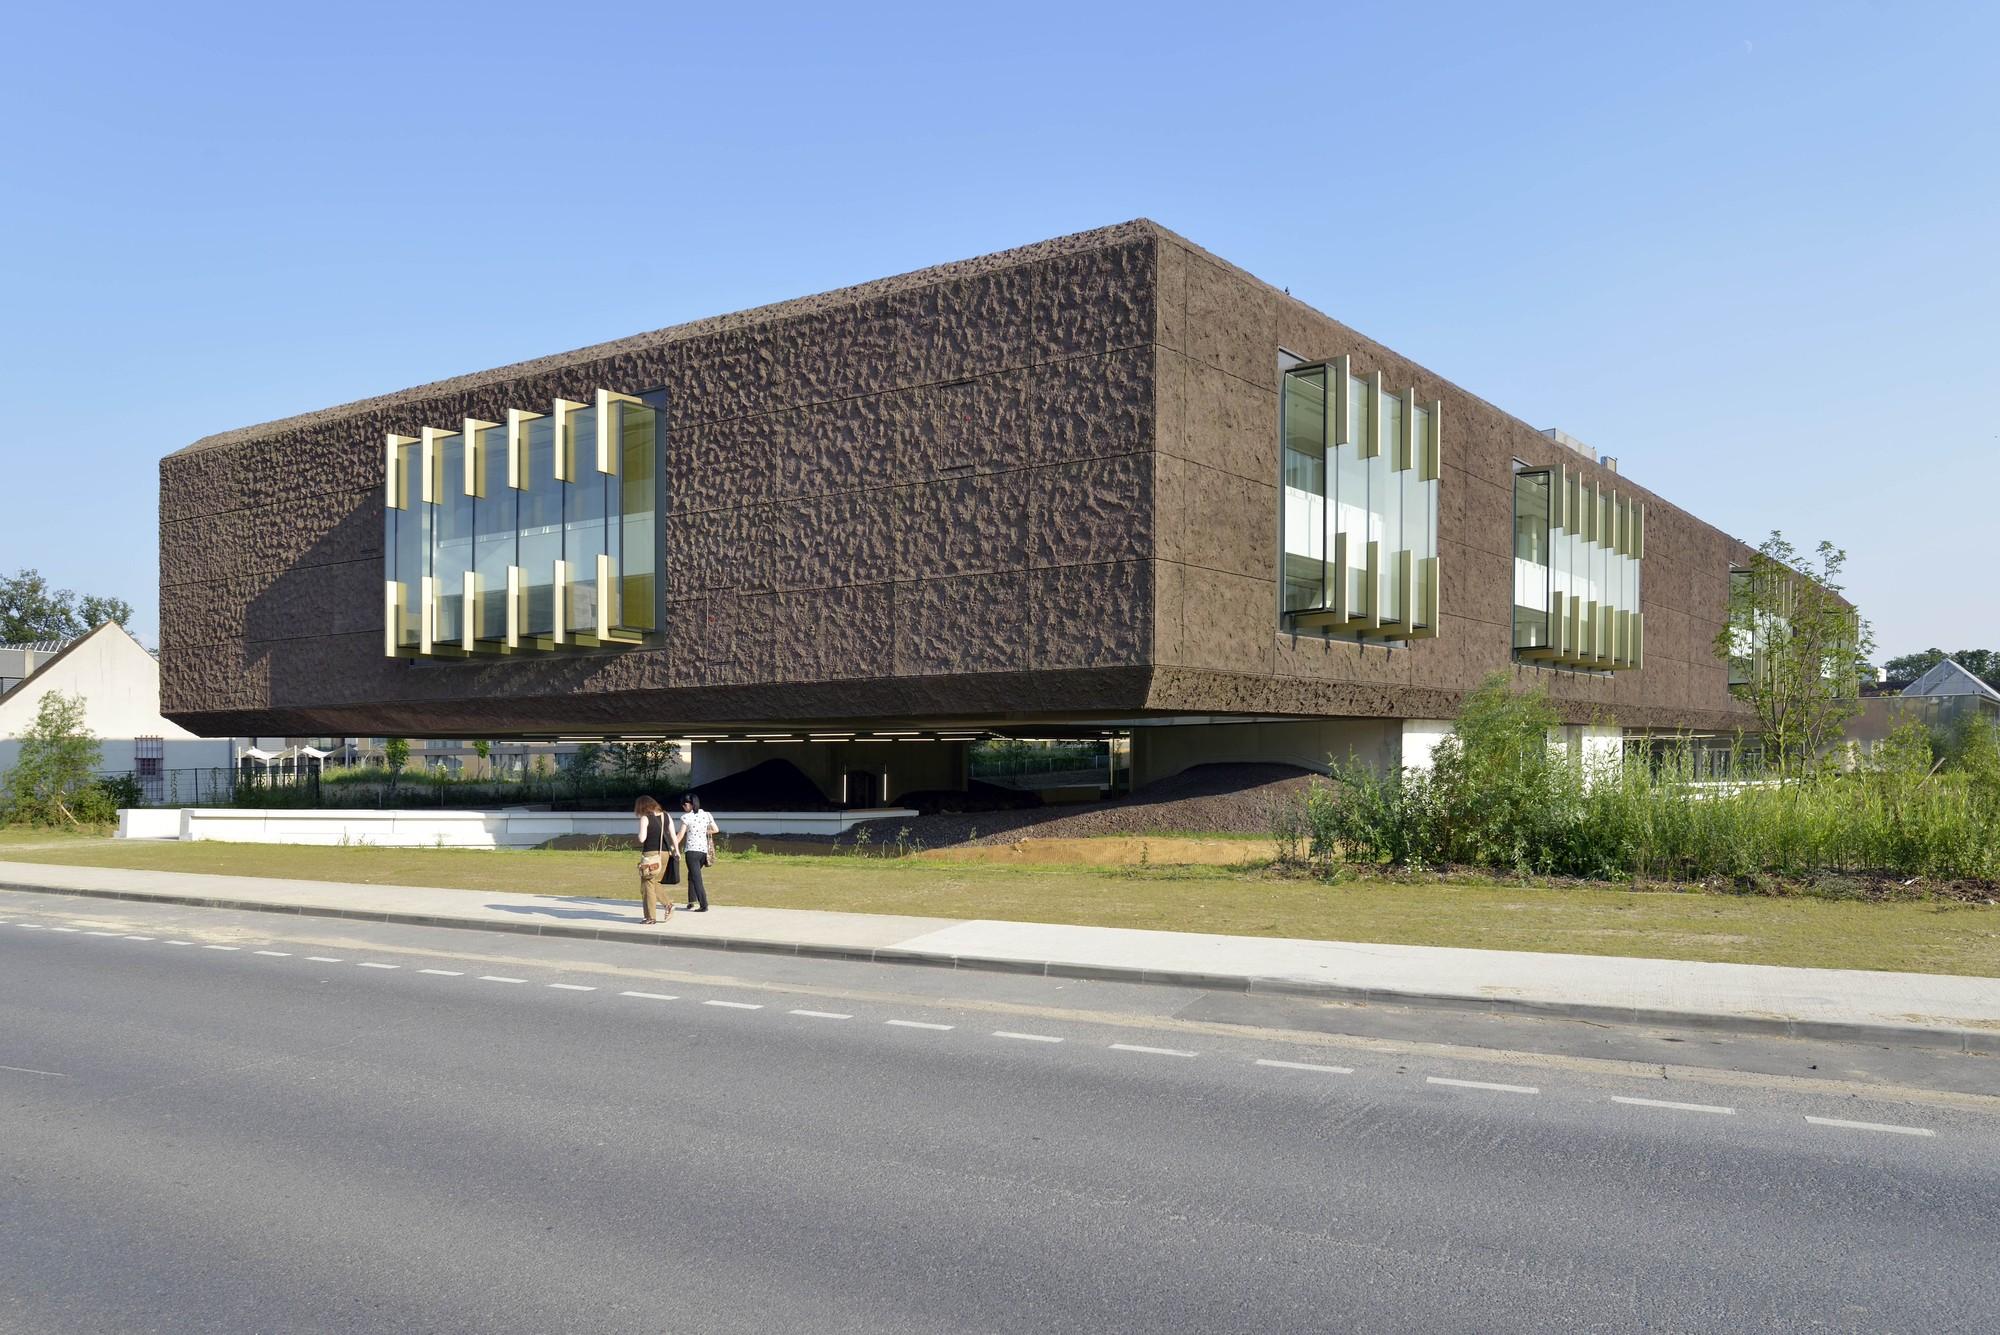 Marne-la-Vallée Library / Beckmann-N'Thépé Architects, © Olivier Amsellem